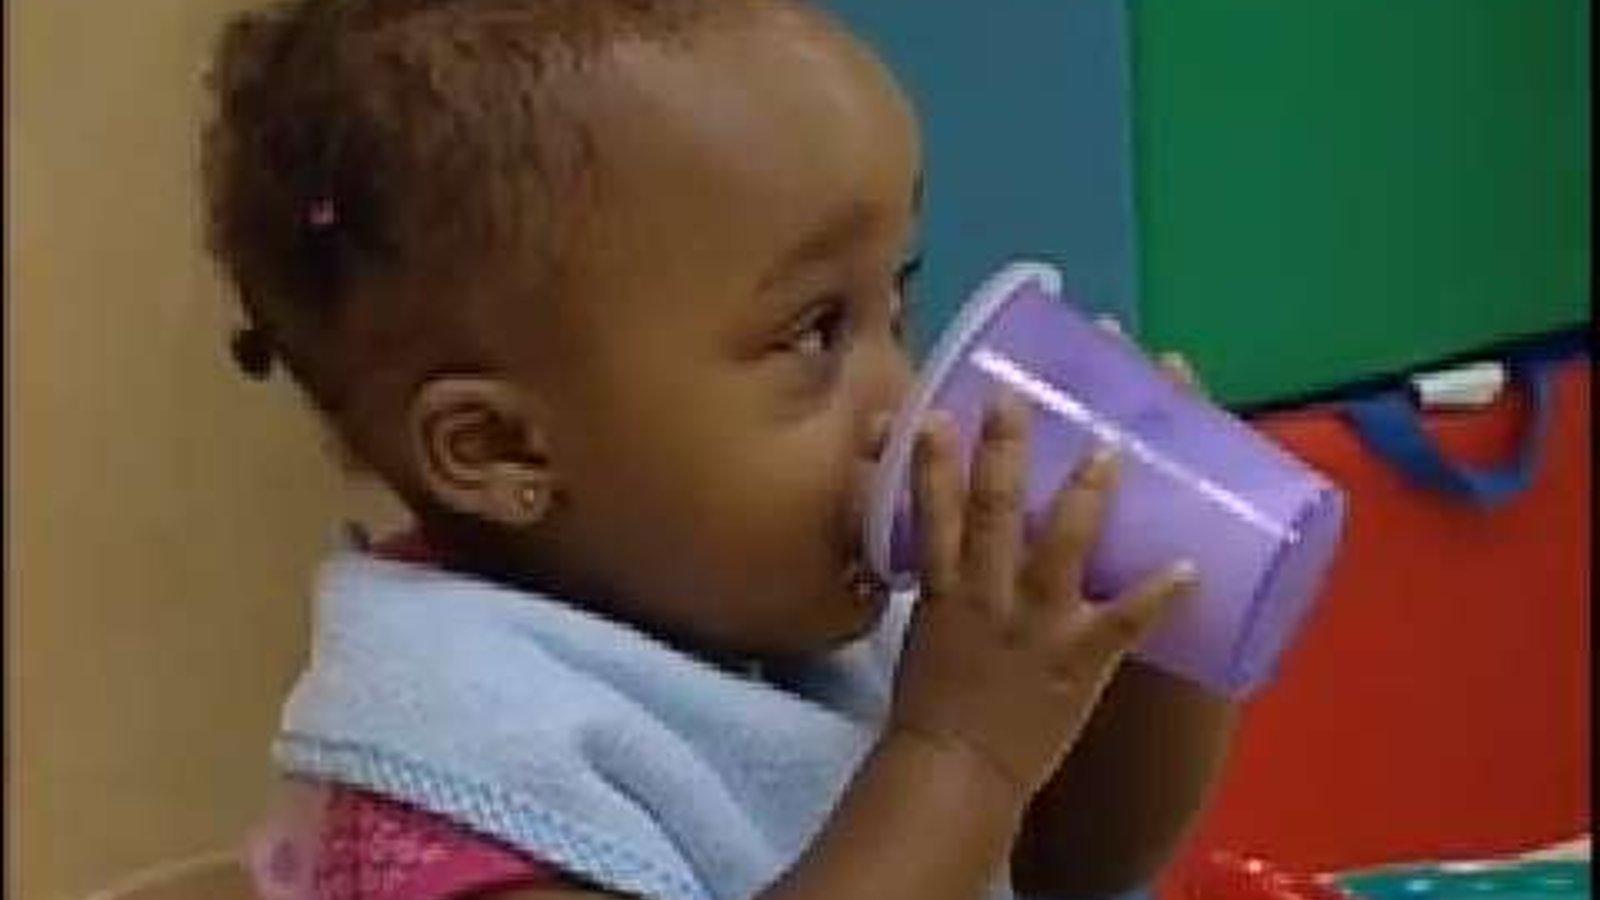 Is Baby OK? Assessing Development